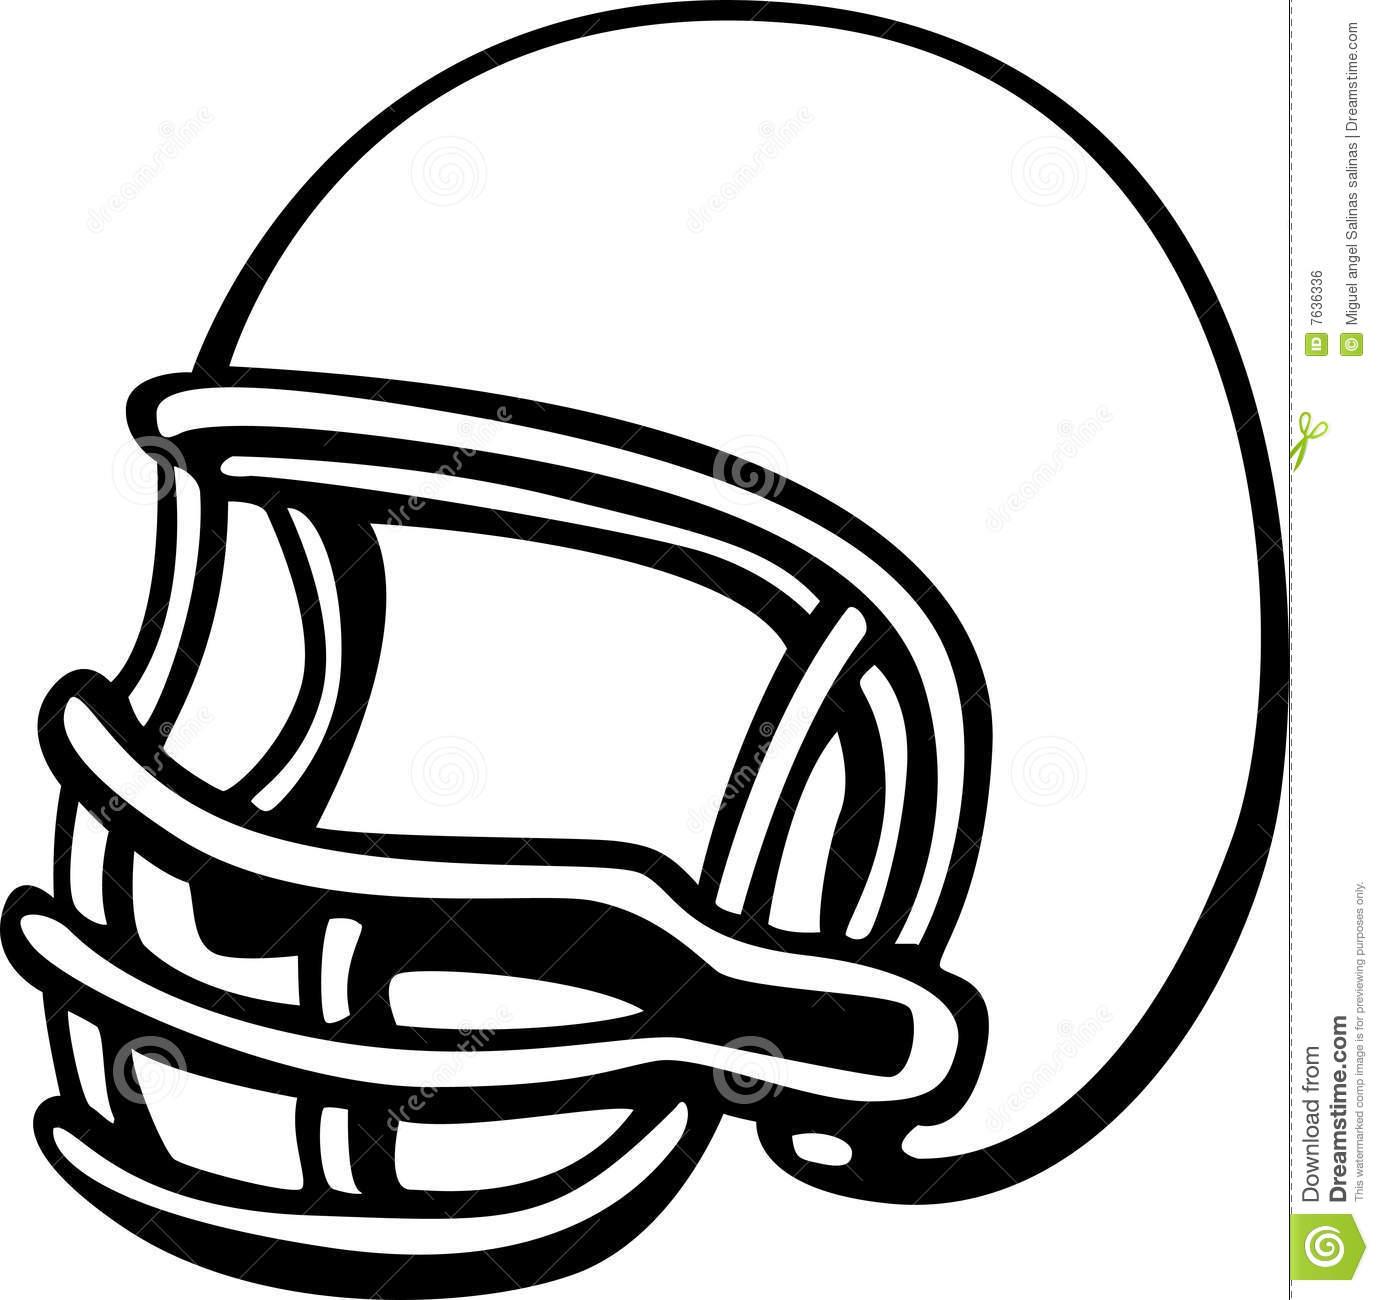 1379x1300 Football Helmet Black And White Clipart